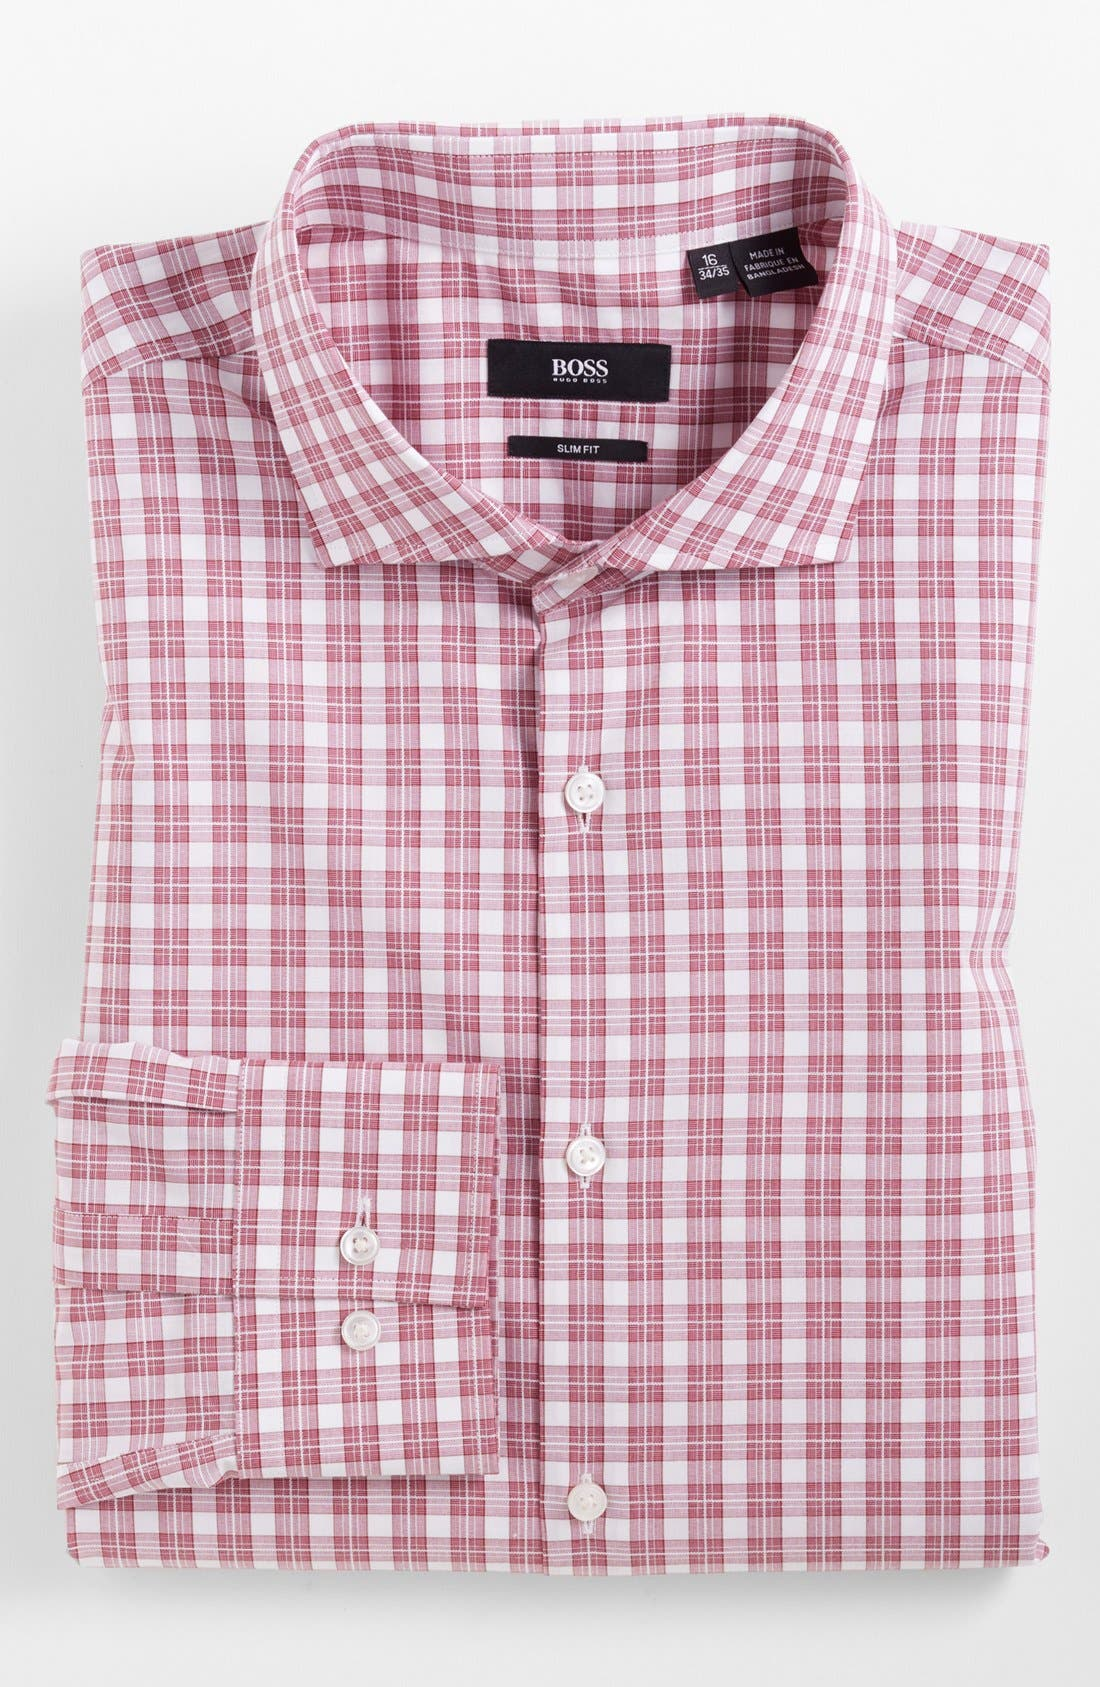 Main Image - BOSS HUGO BOSS 'Jason' Slim Fit Dress Shirt